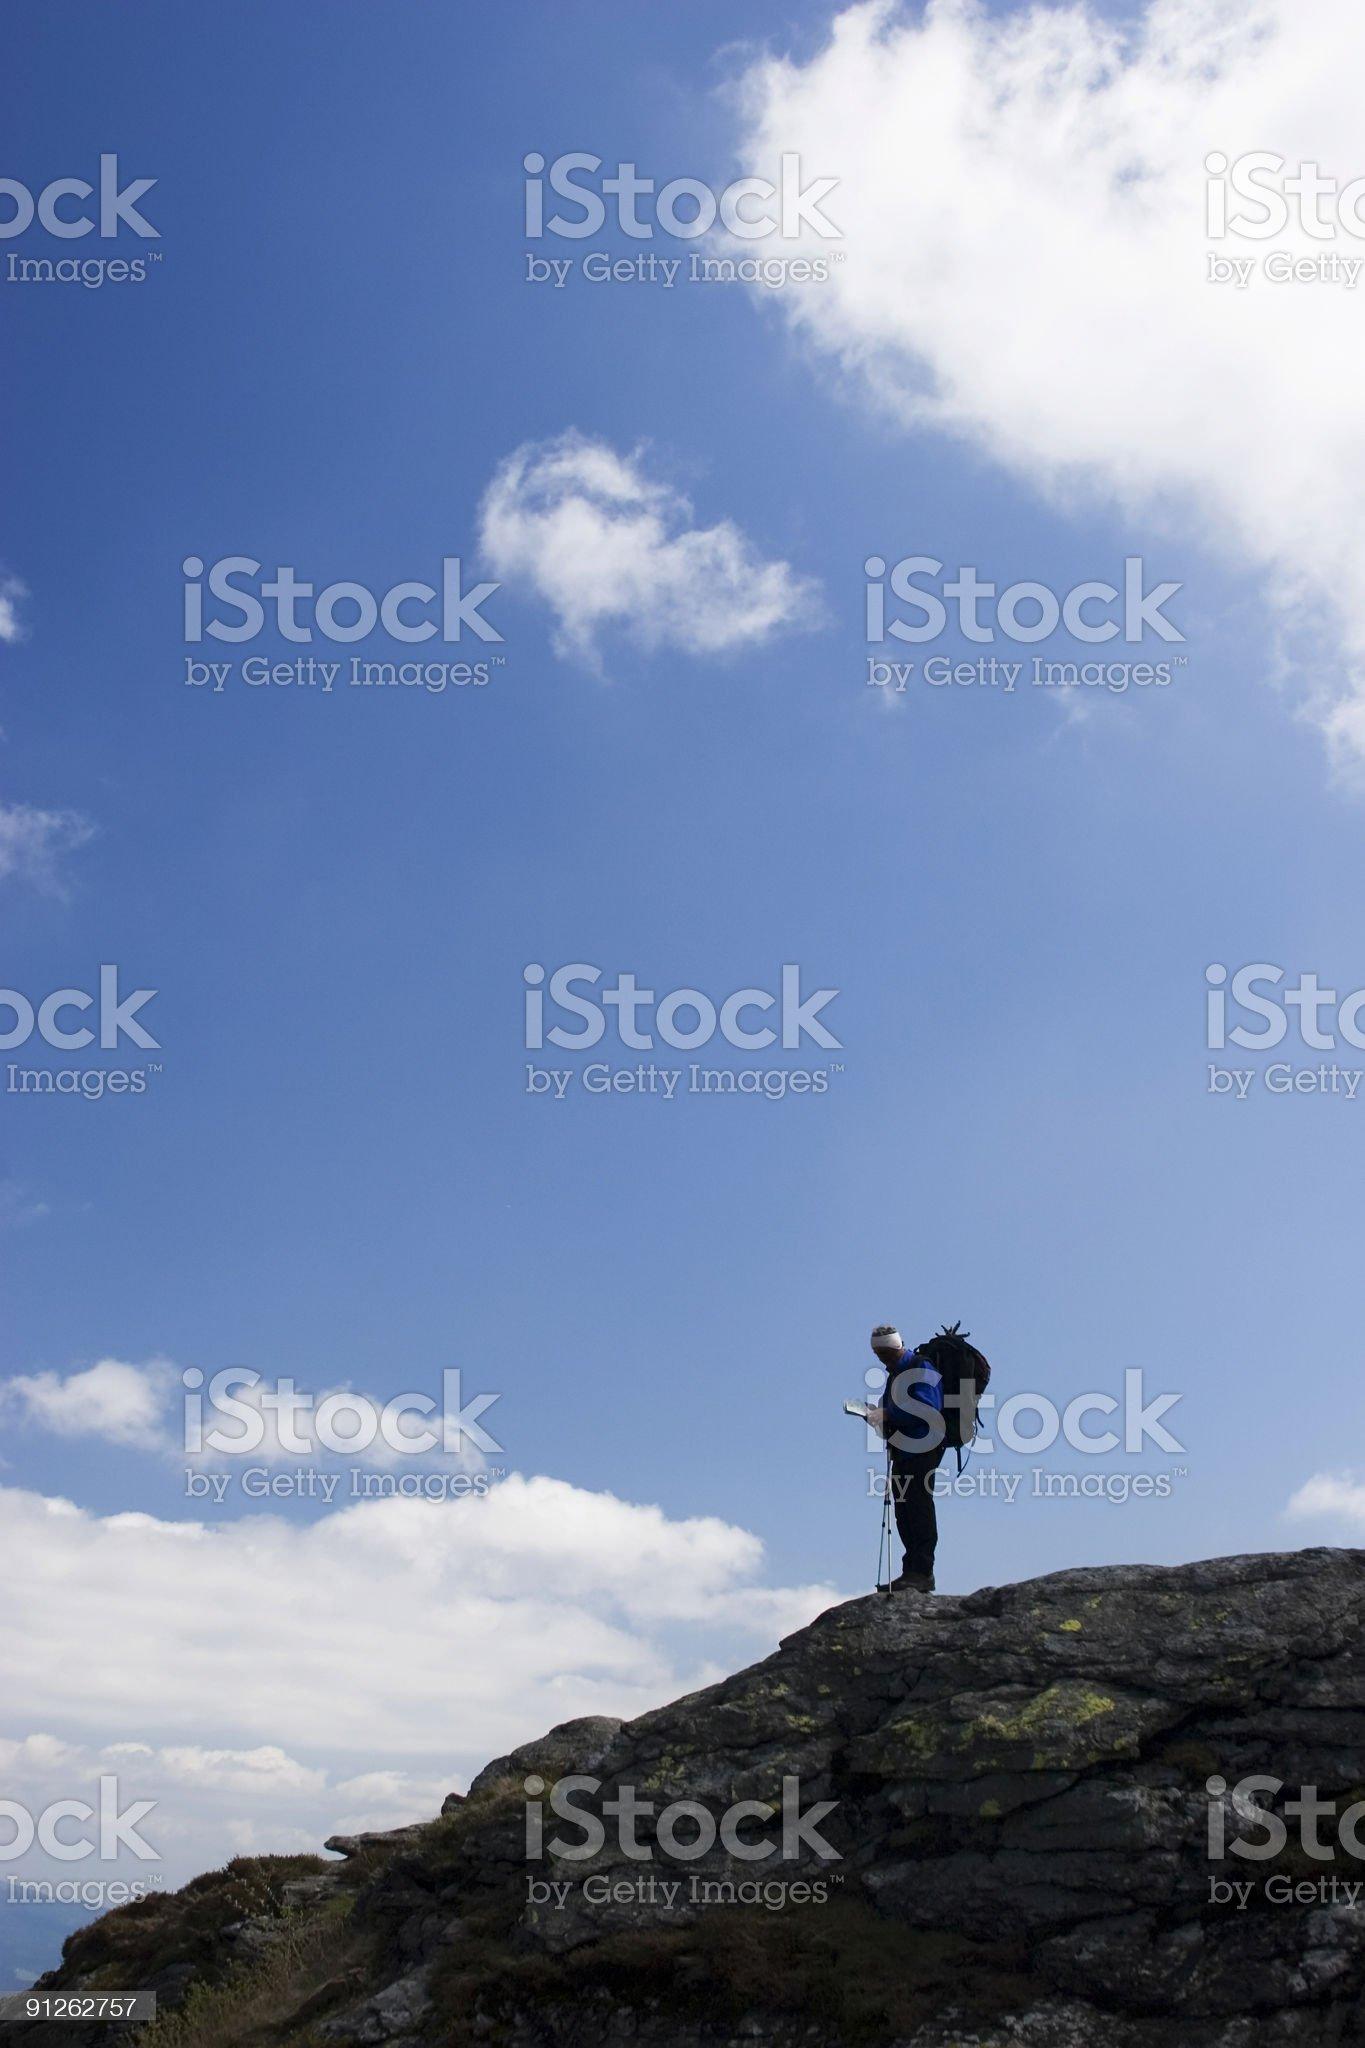 on the mountain royalty-free stock photo